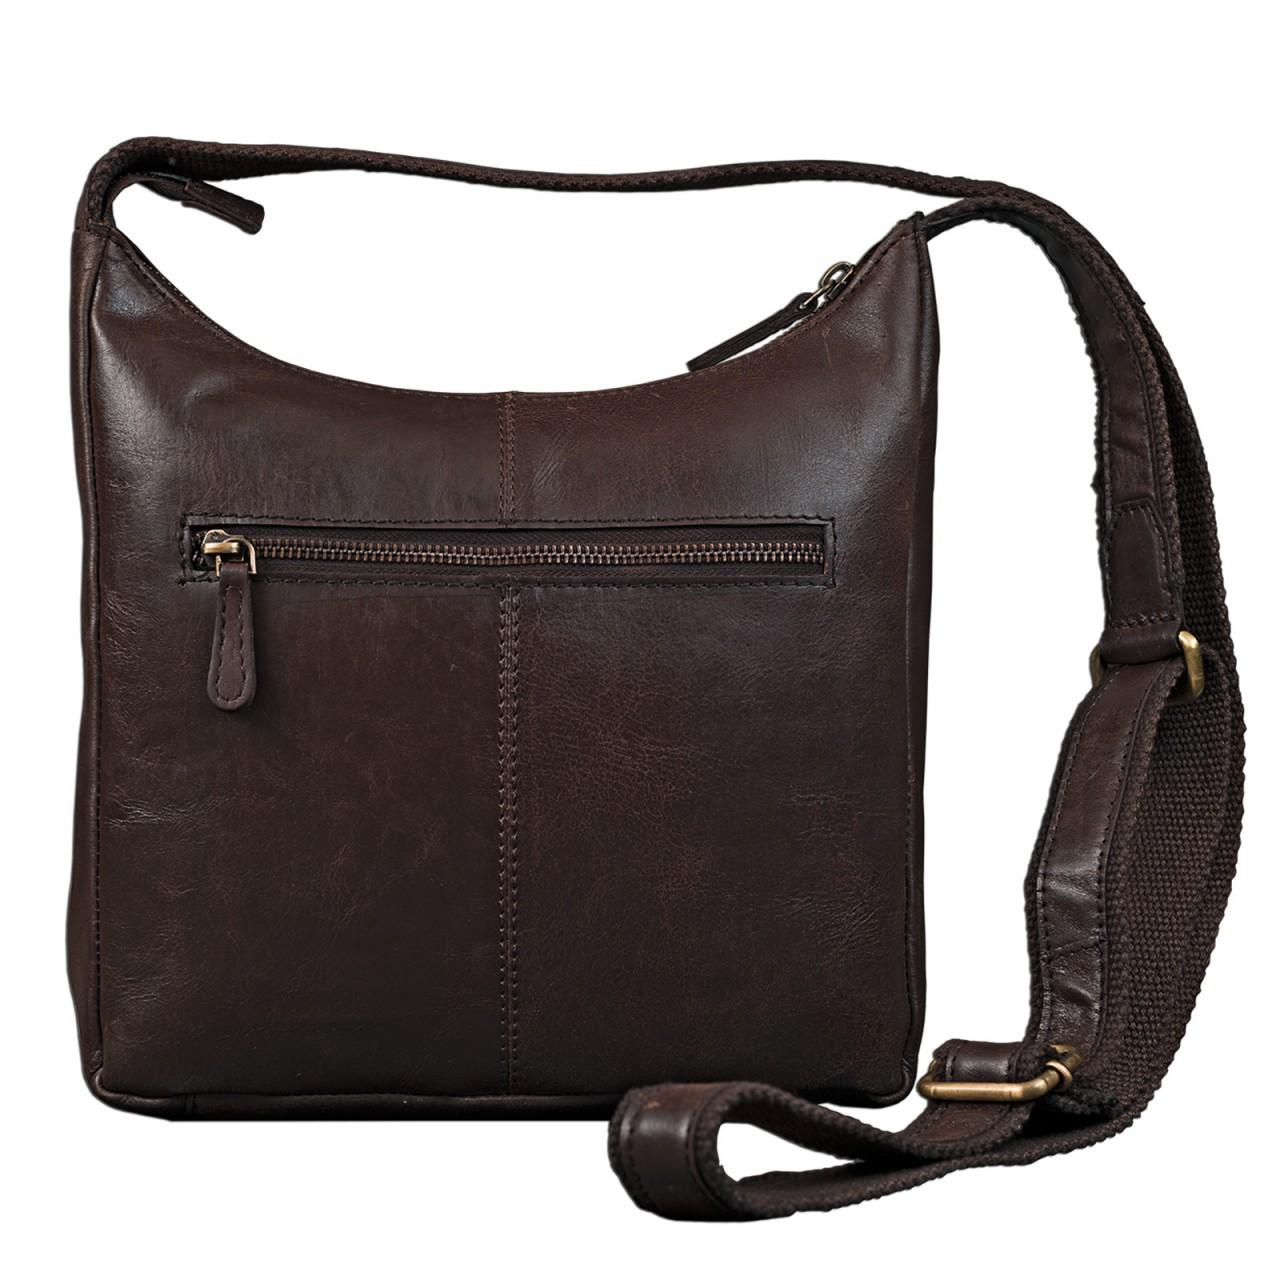 f904856df9a41 Umhängetasche Leder Dunkelbraun Vintage Damen Handtasche VSzUqMp